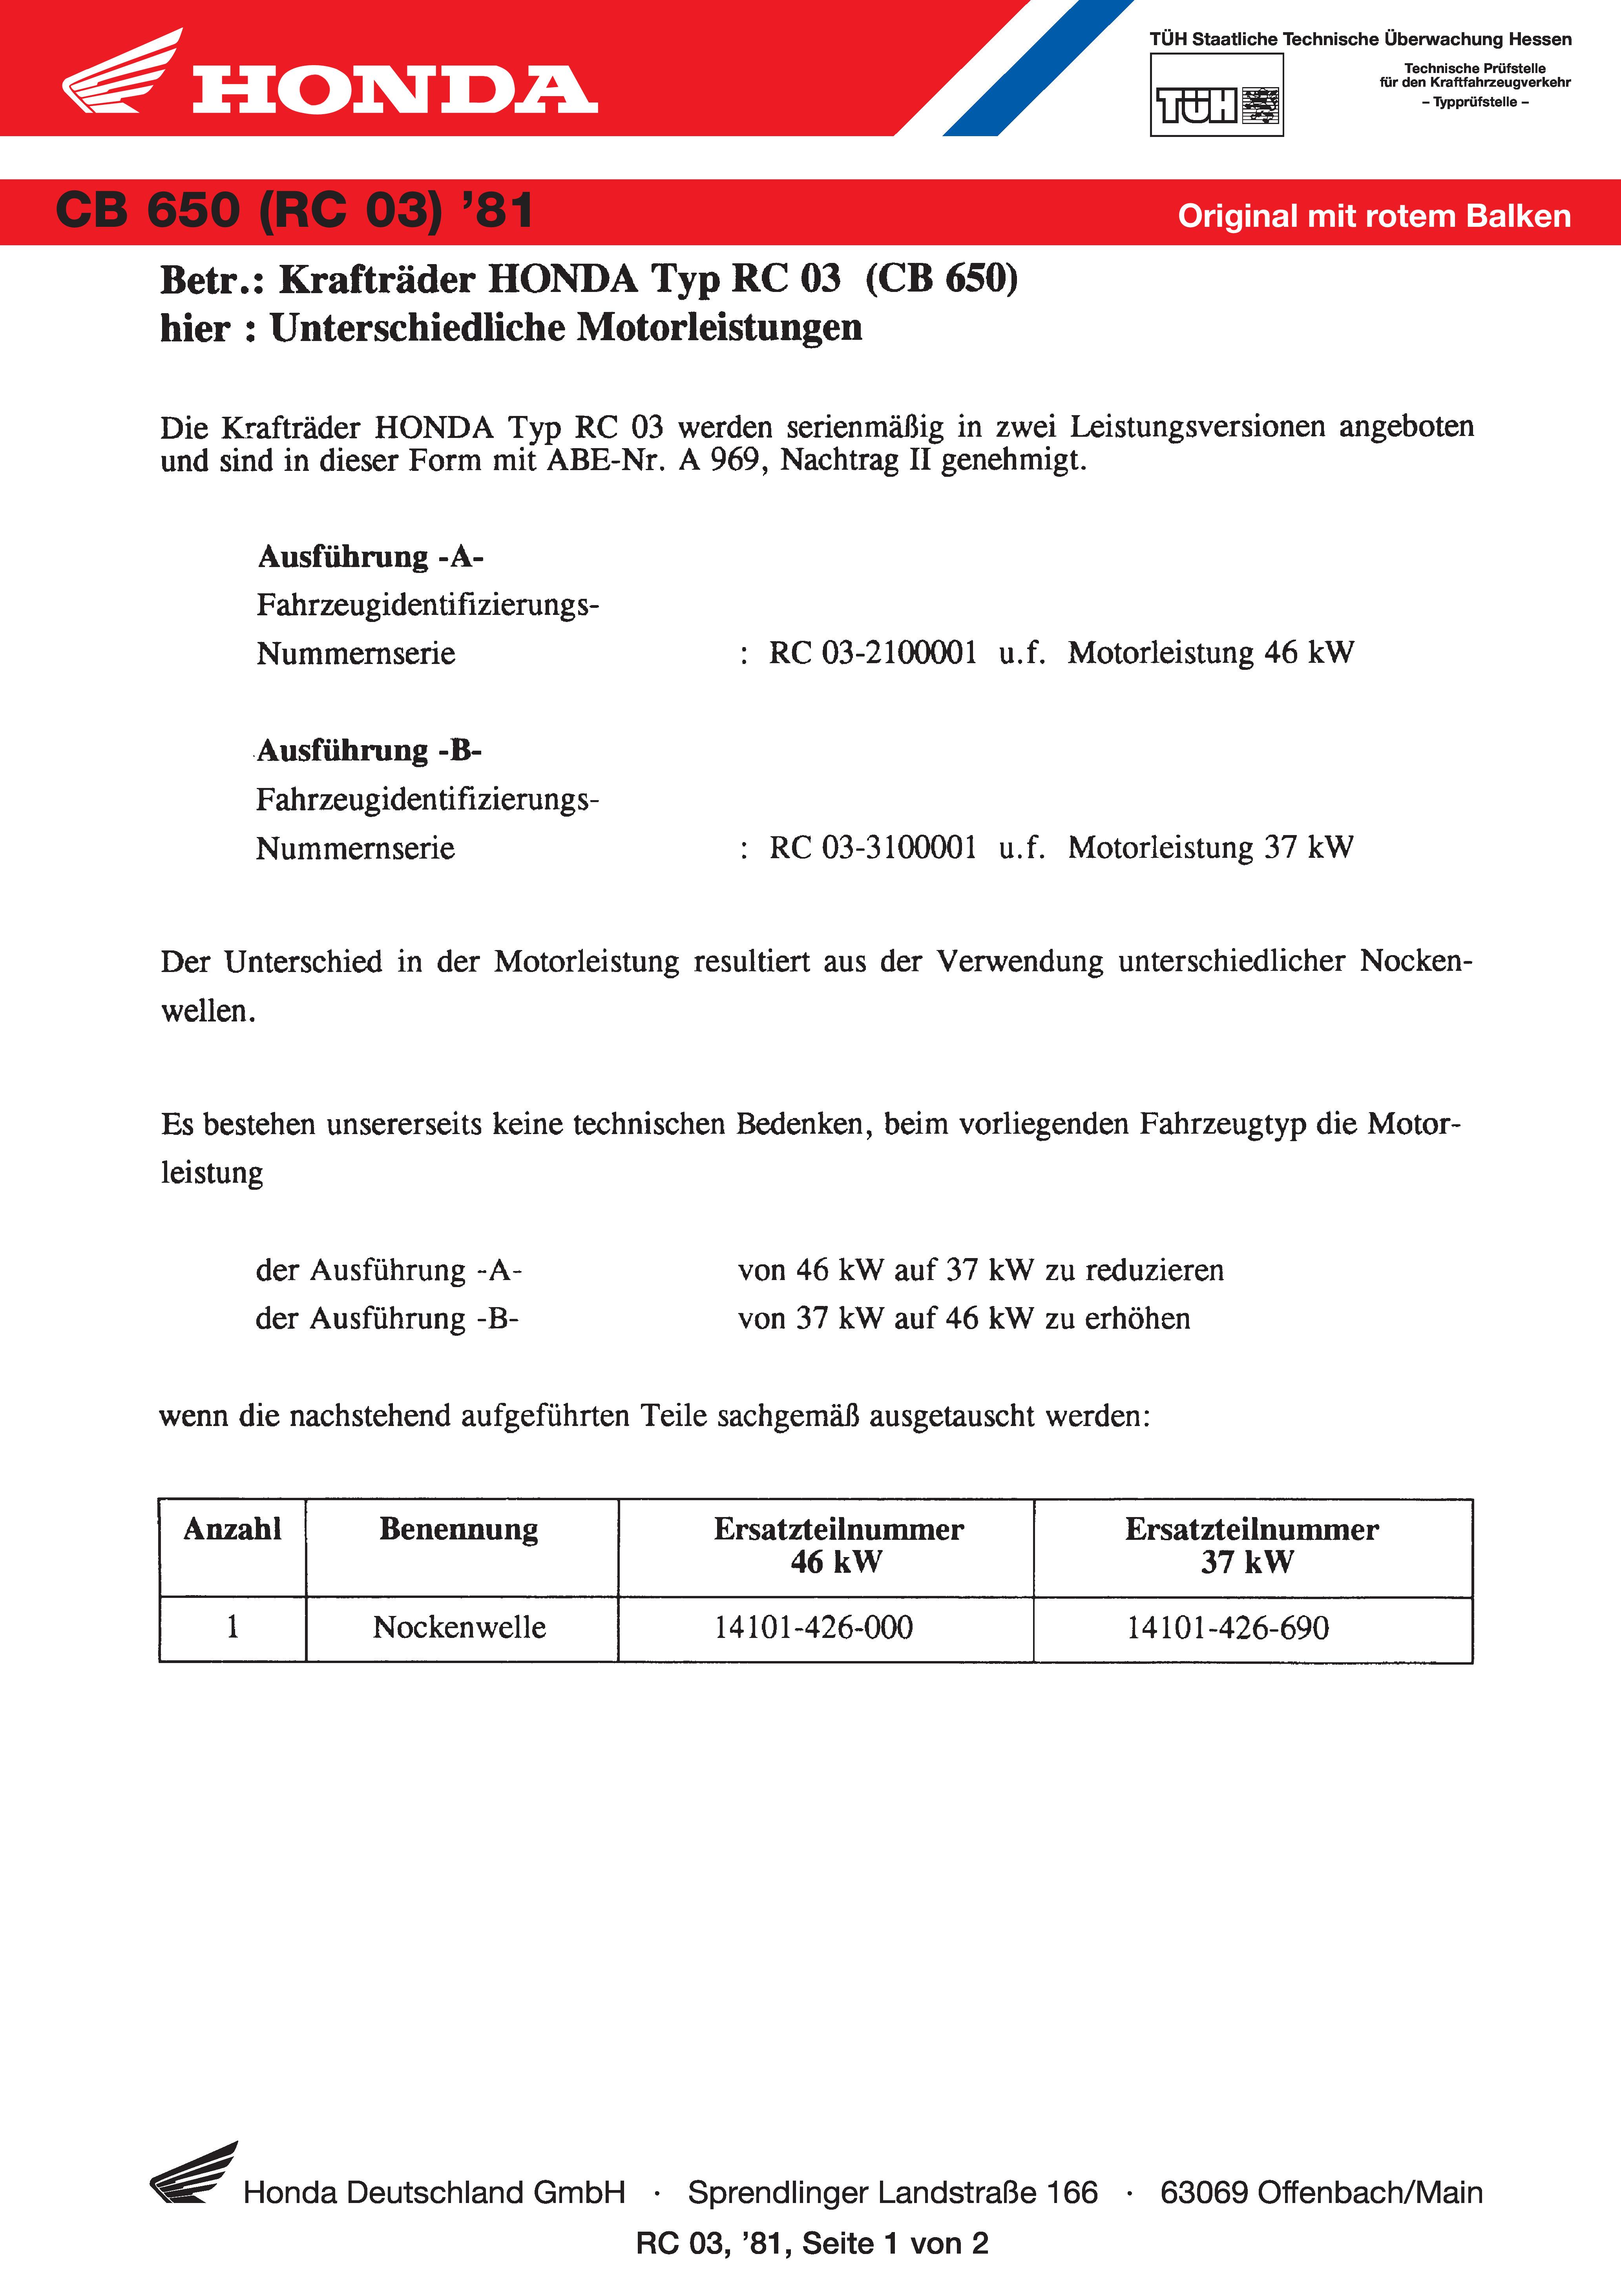 Conformity declaration Honda CB650 RC03 (Germany) (1981)